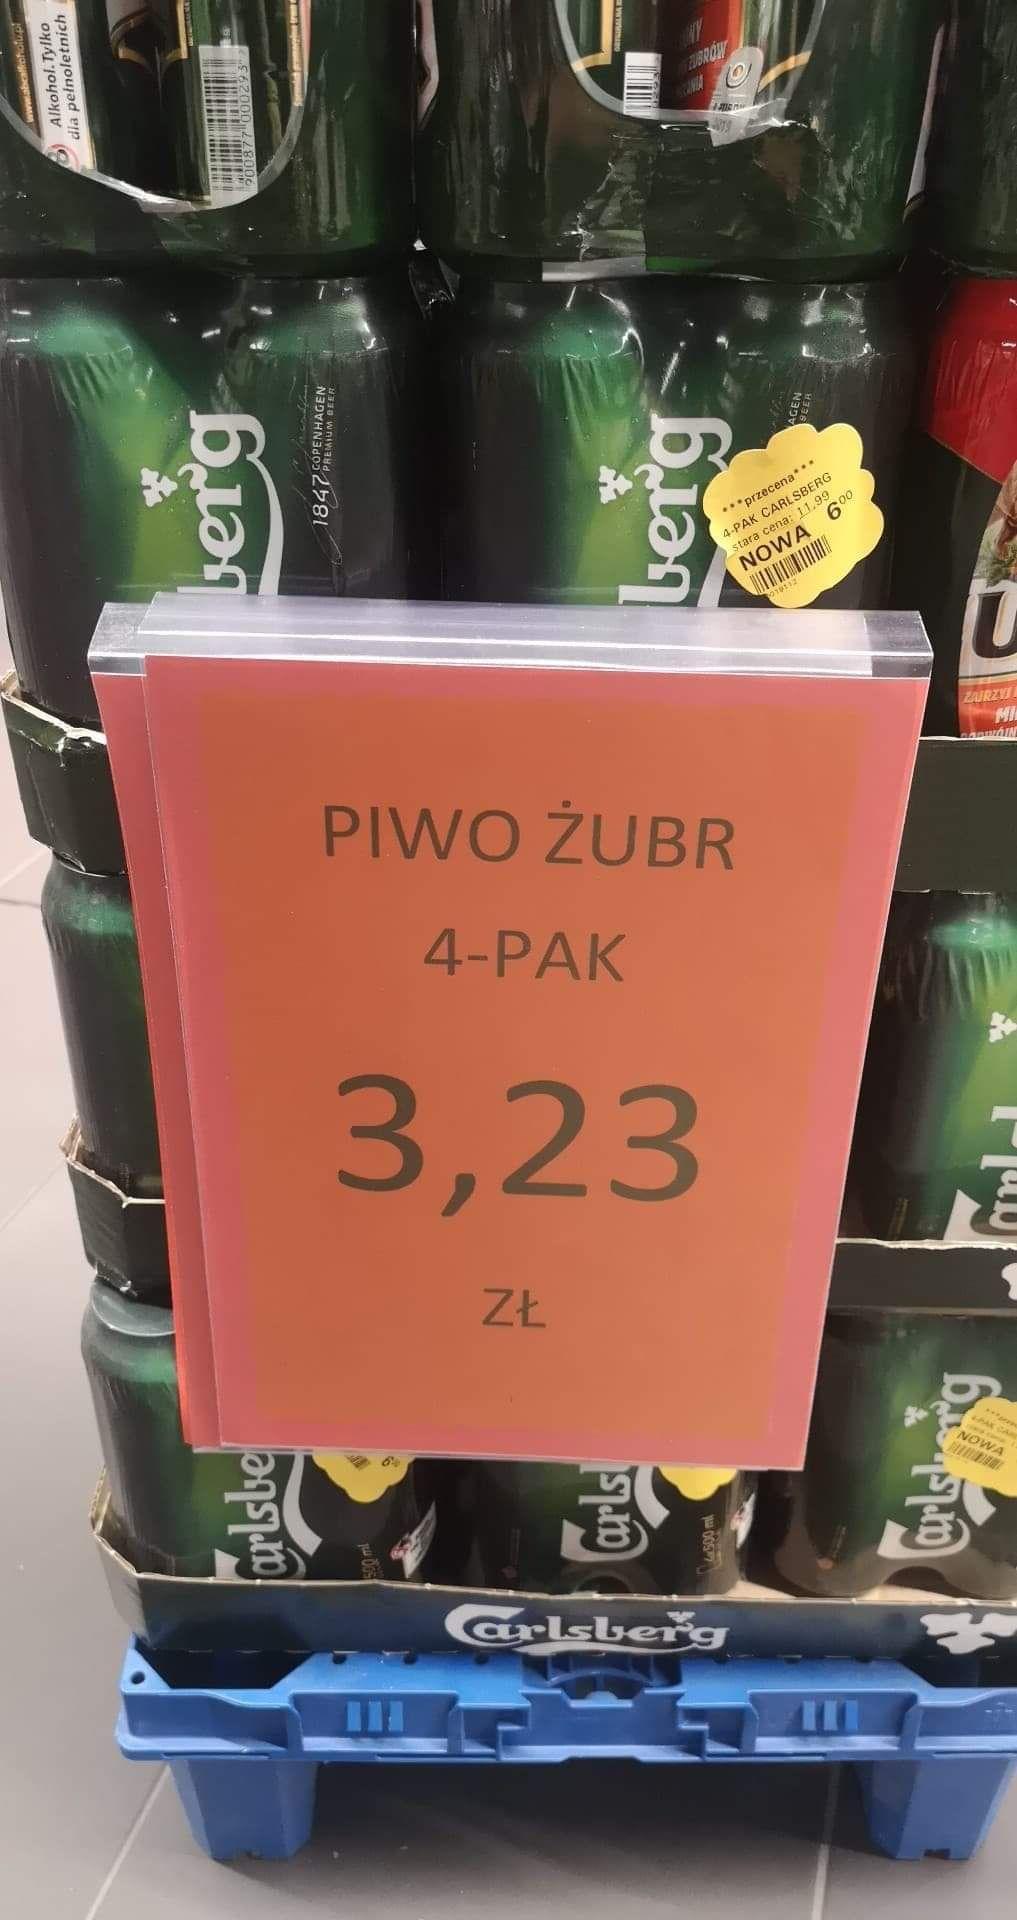 Piwo żubr lub carlsberg 4pak - netto Gdańsk Madison